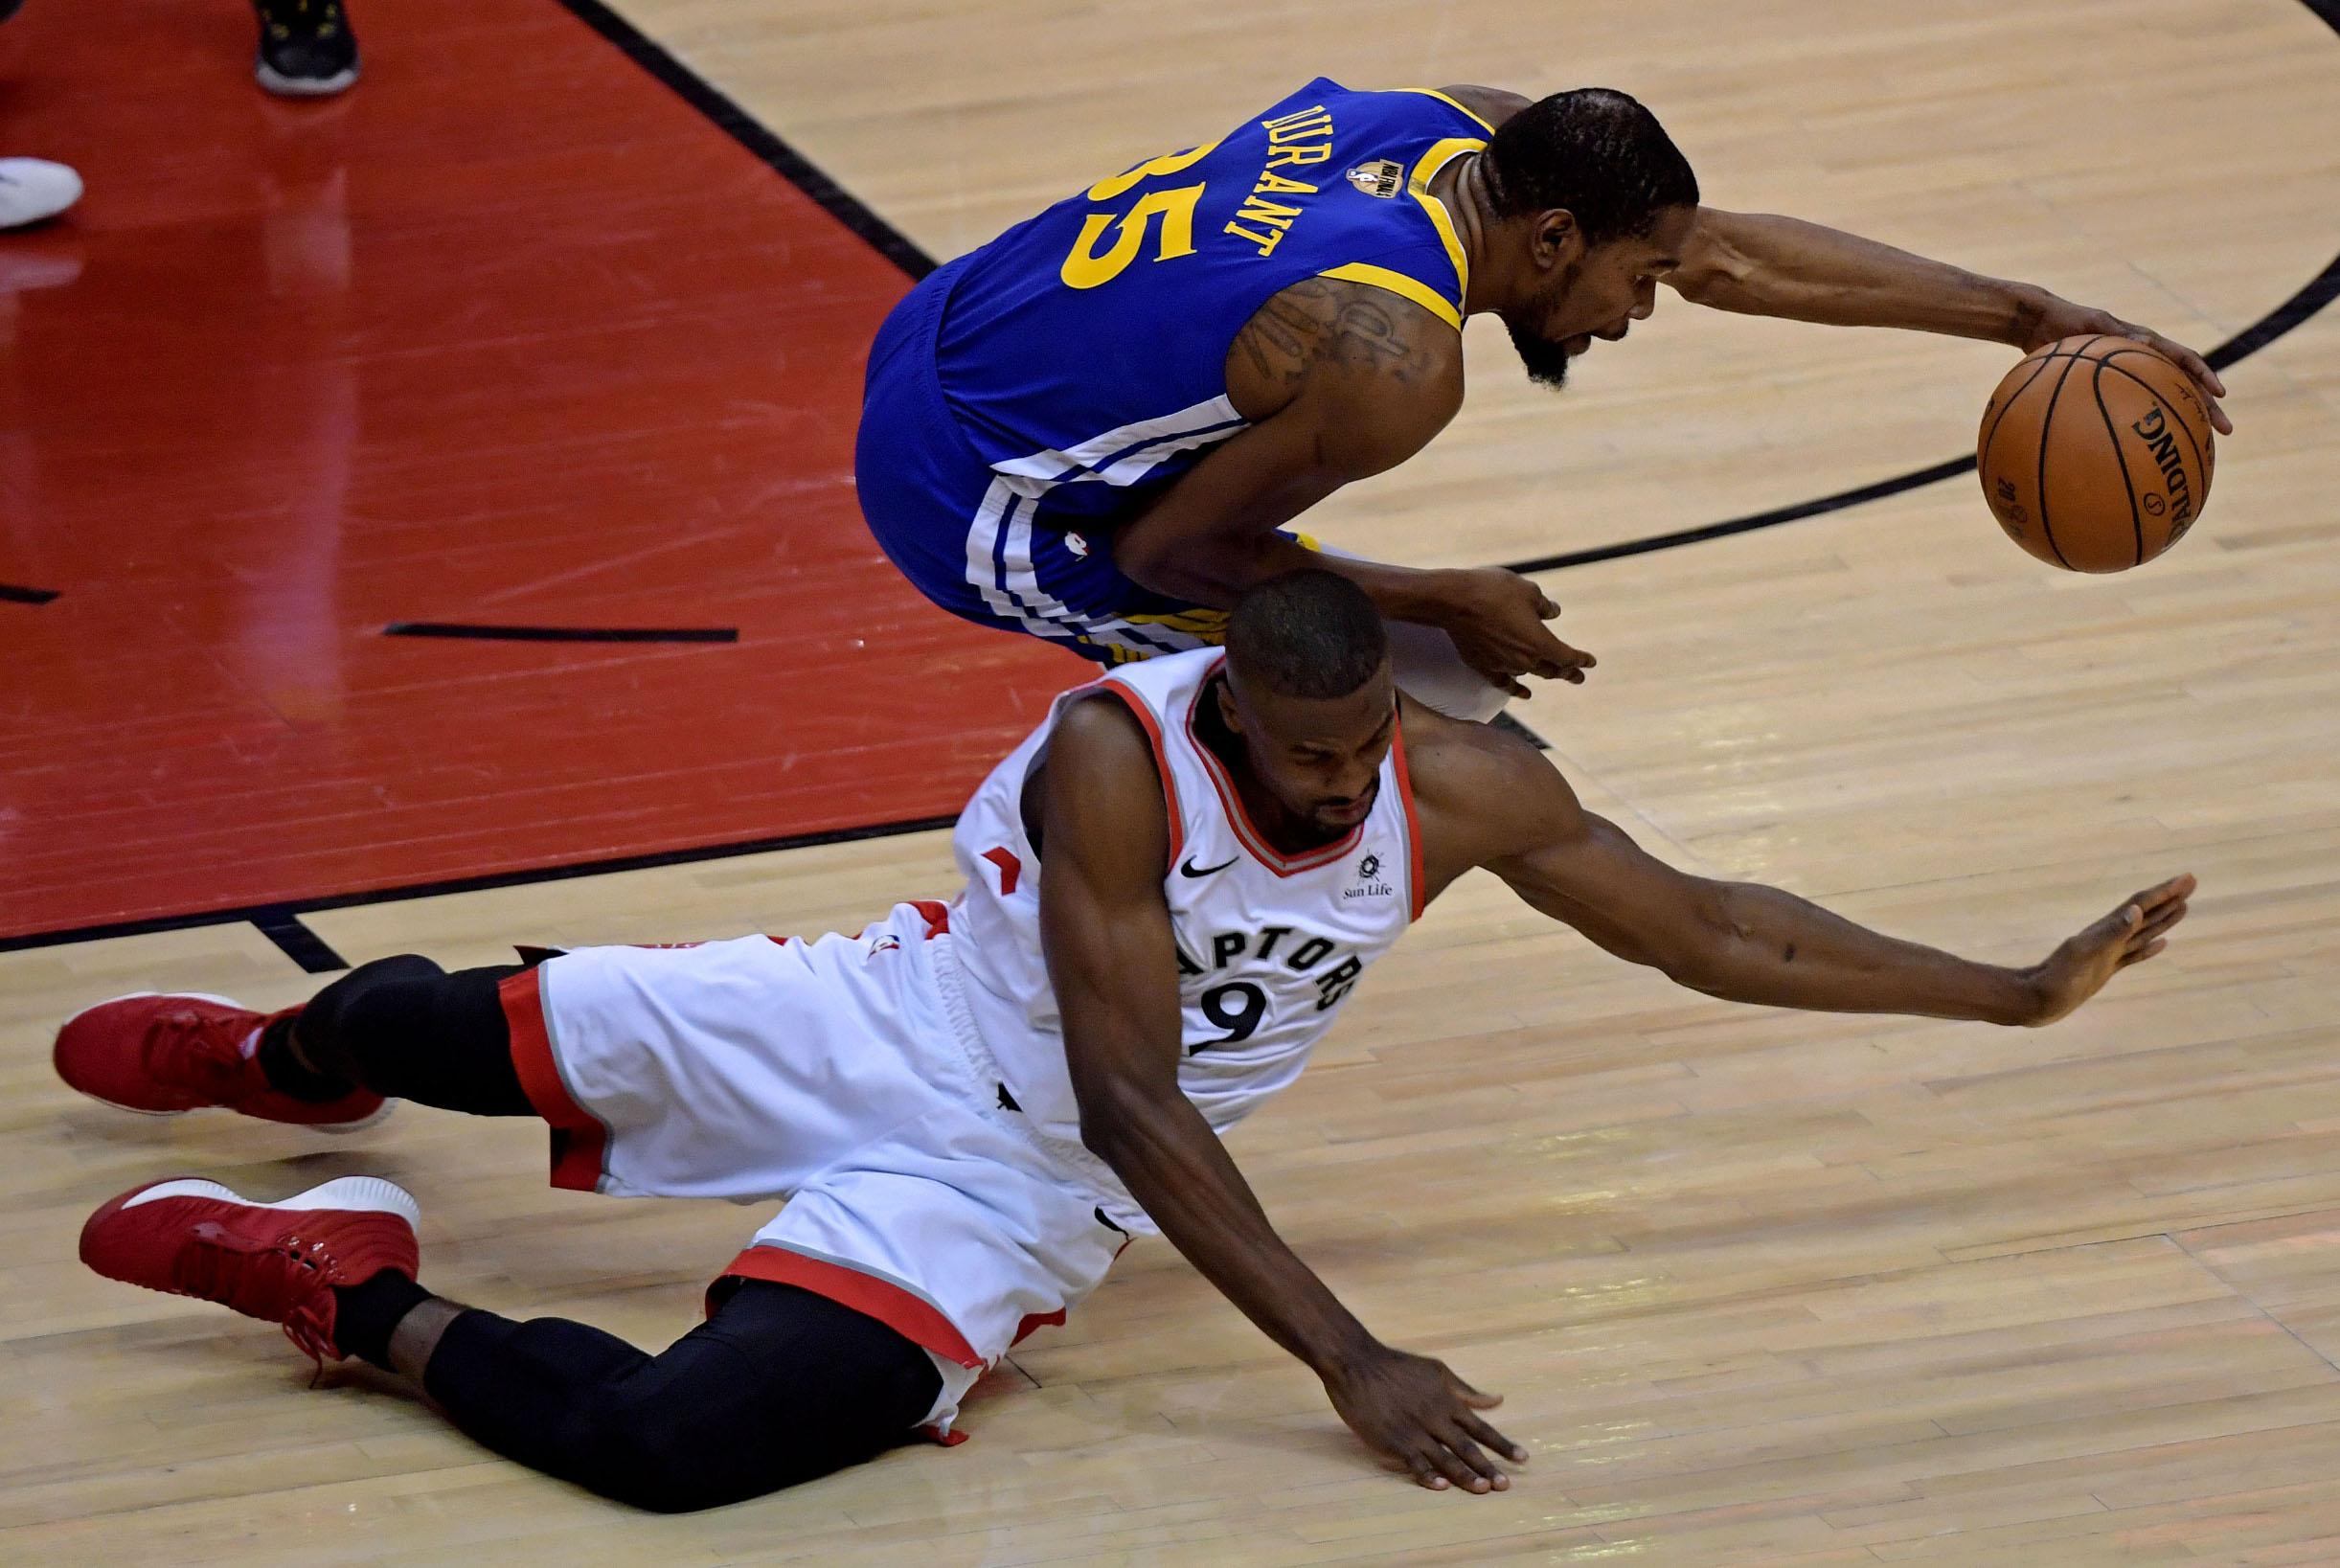 2019-06-11T020648Z_898334313_NOCID_RTRMADP_3_NBA-FINALS-GOLDEN-STATE-WARRIORS-AT-TORONTO-RAPTORS